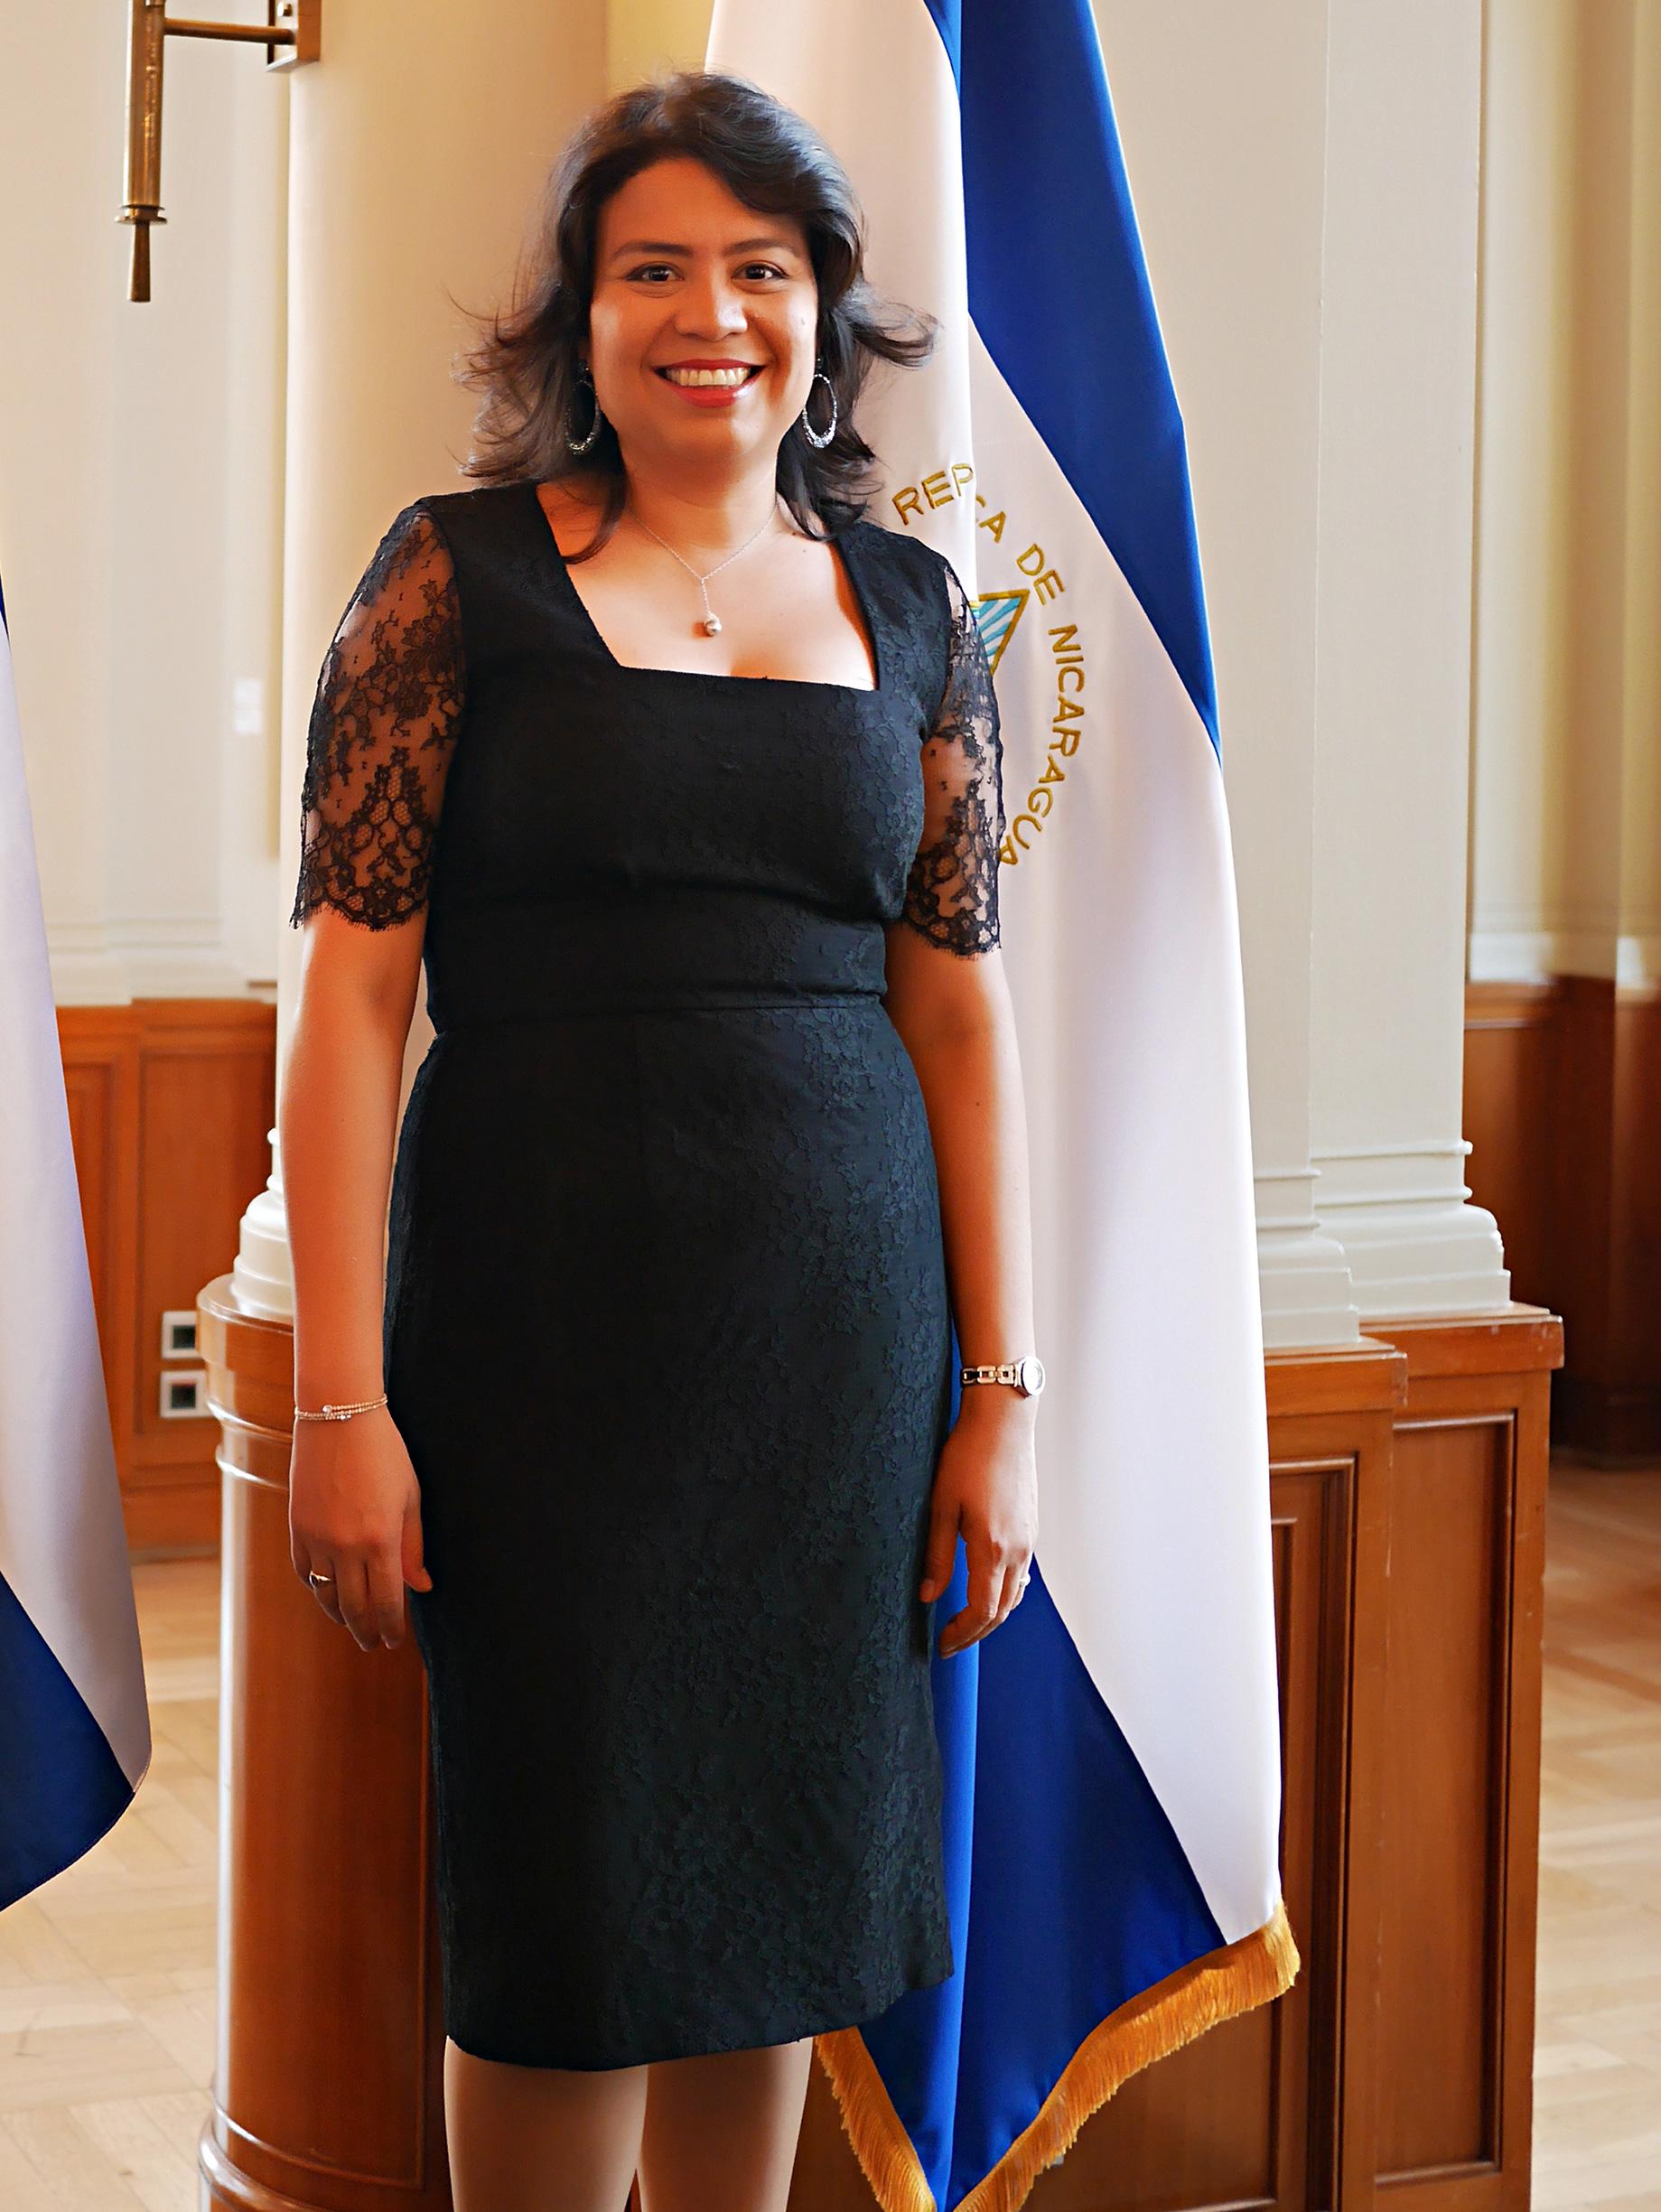 S.E. Karla Luzette Beteta Brenes